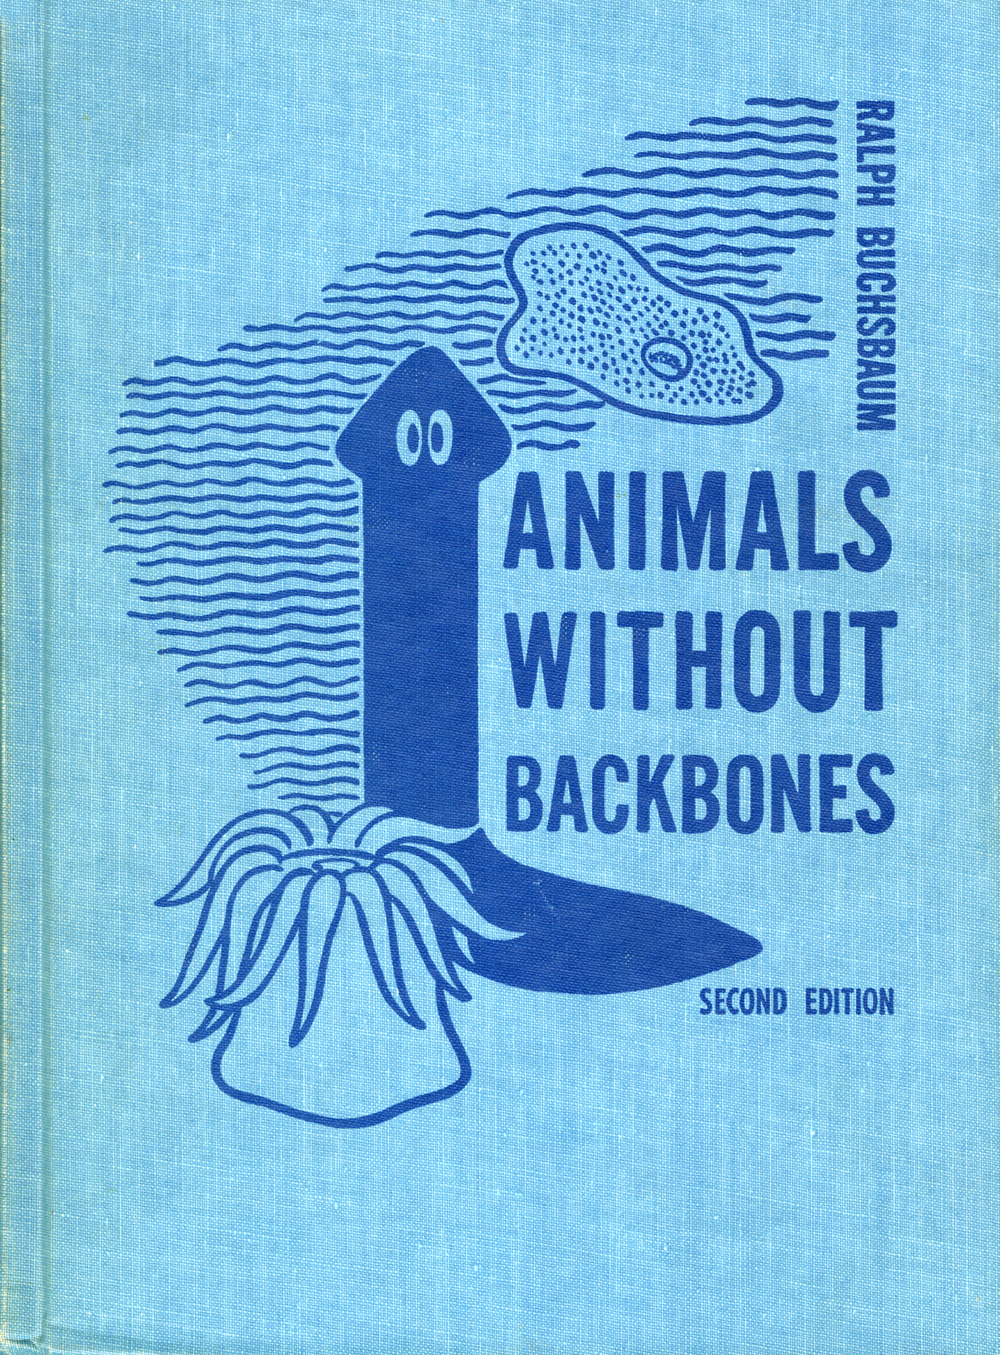 Elizabeth Buchsbaum,Animals Without Backbones (2nd edition). Written by Ralph Buchsbaum.1st Edition published in 1938, 2nd edition in 1948 by University of Chicago Press.